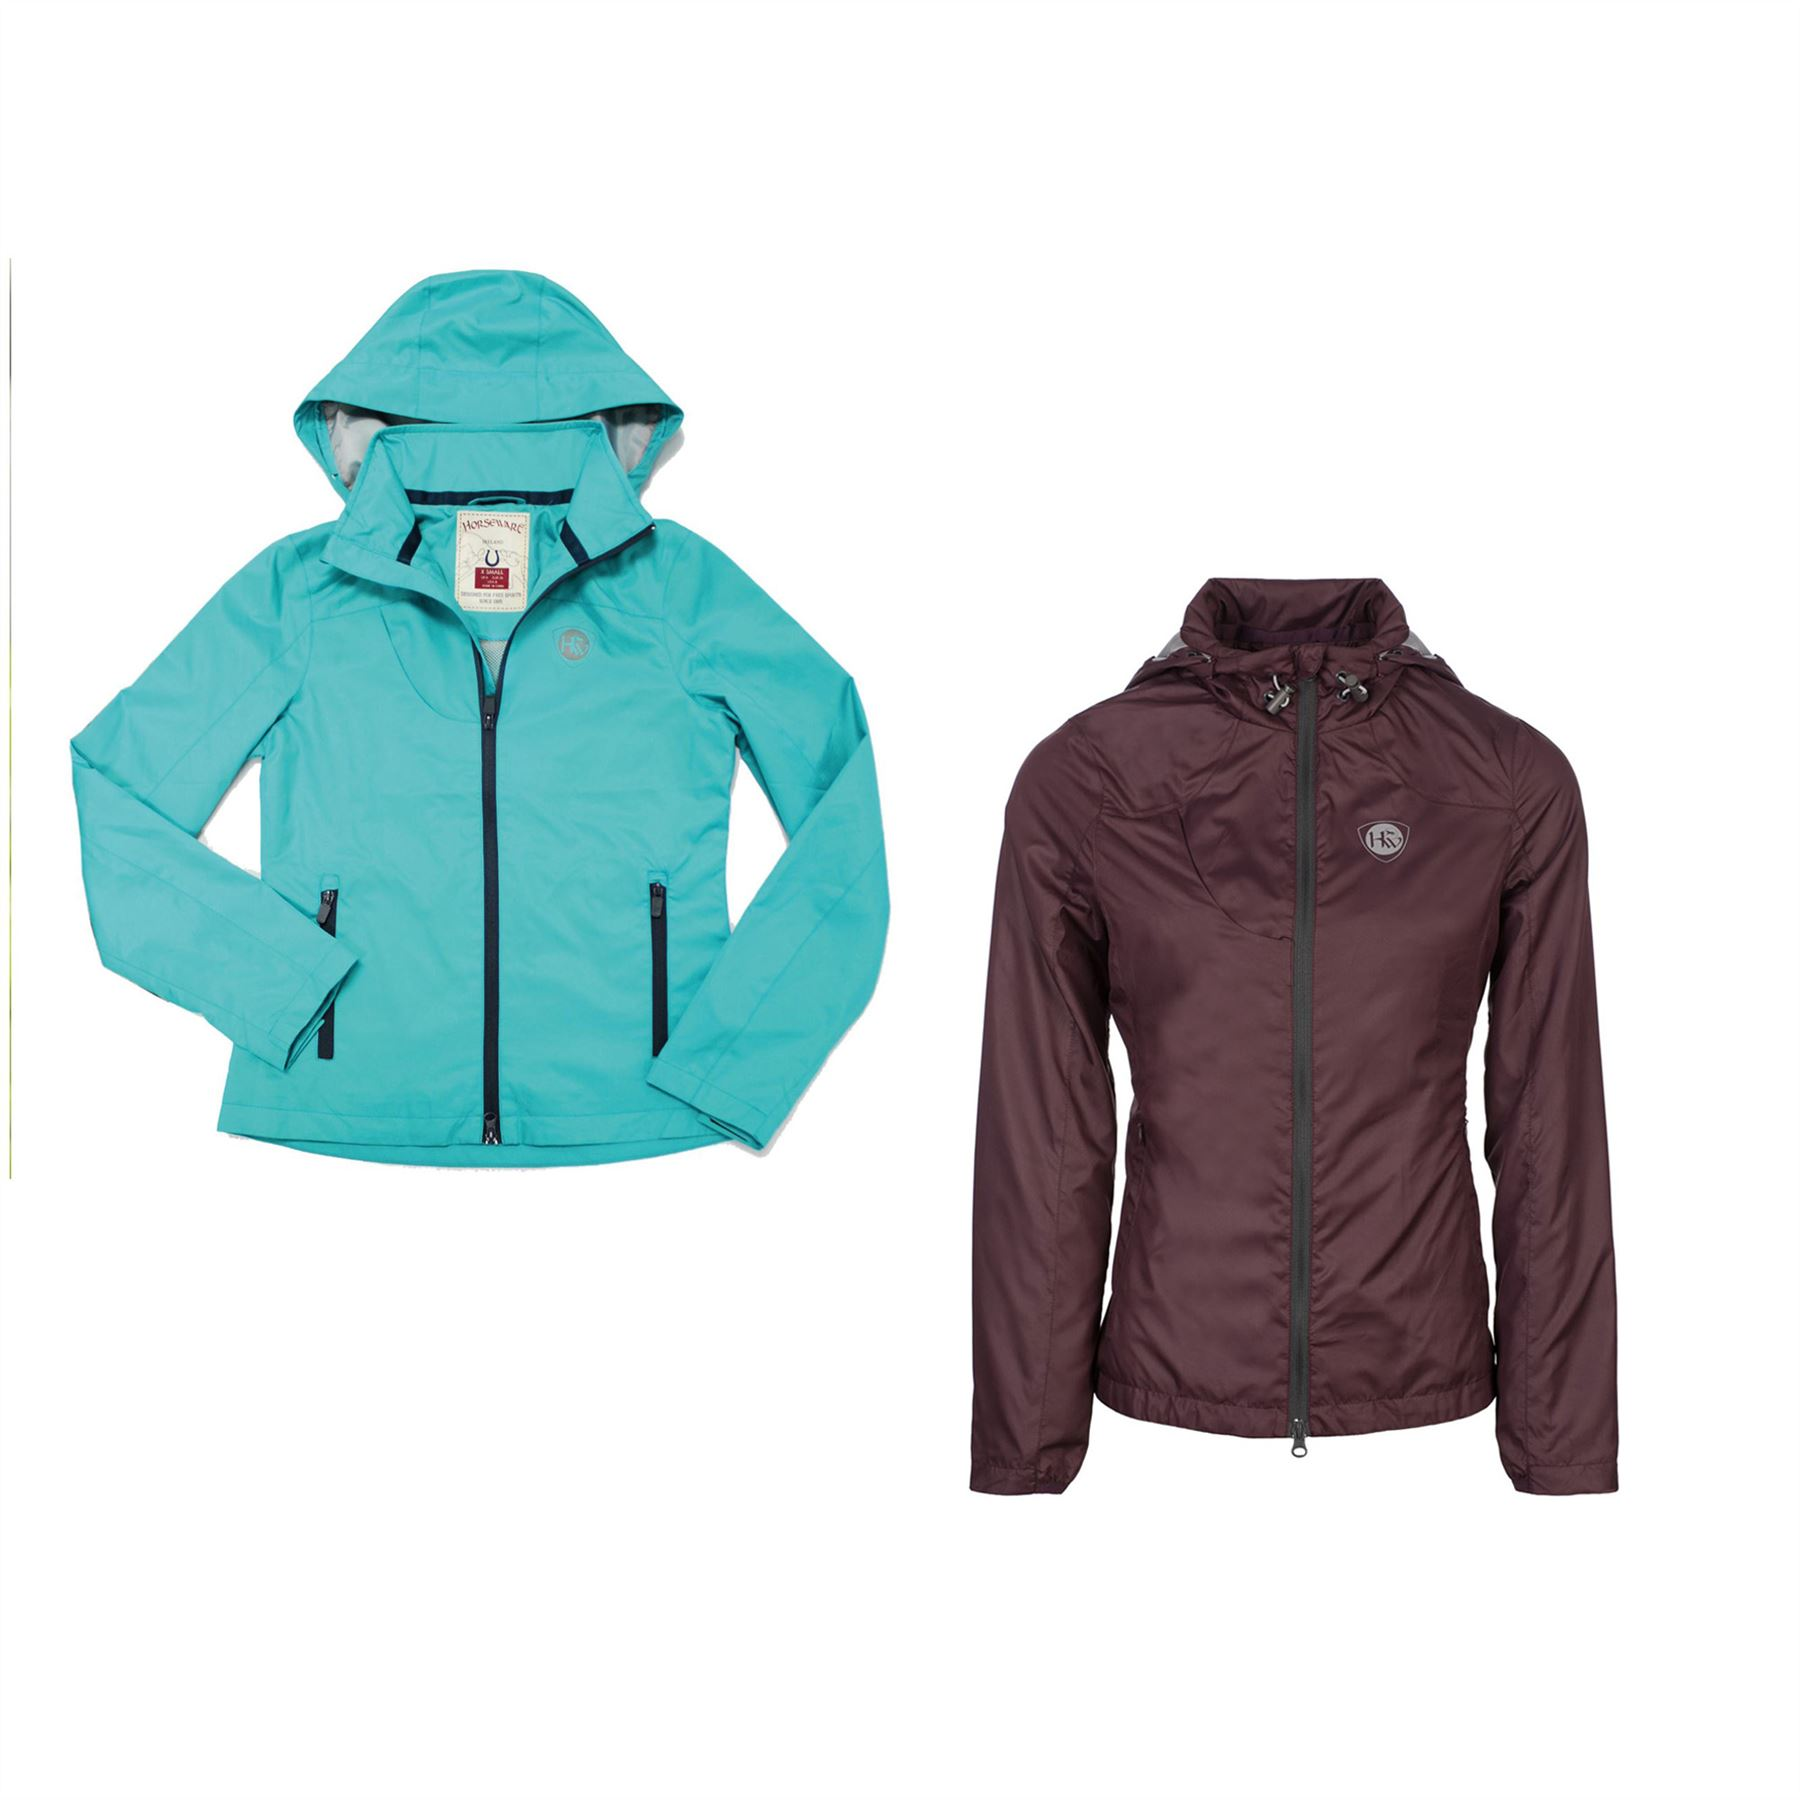 Details about Horseware Nessa Jacket Womens Equestrian Horse Riding Coat  Outerwear 697fdb10292